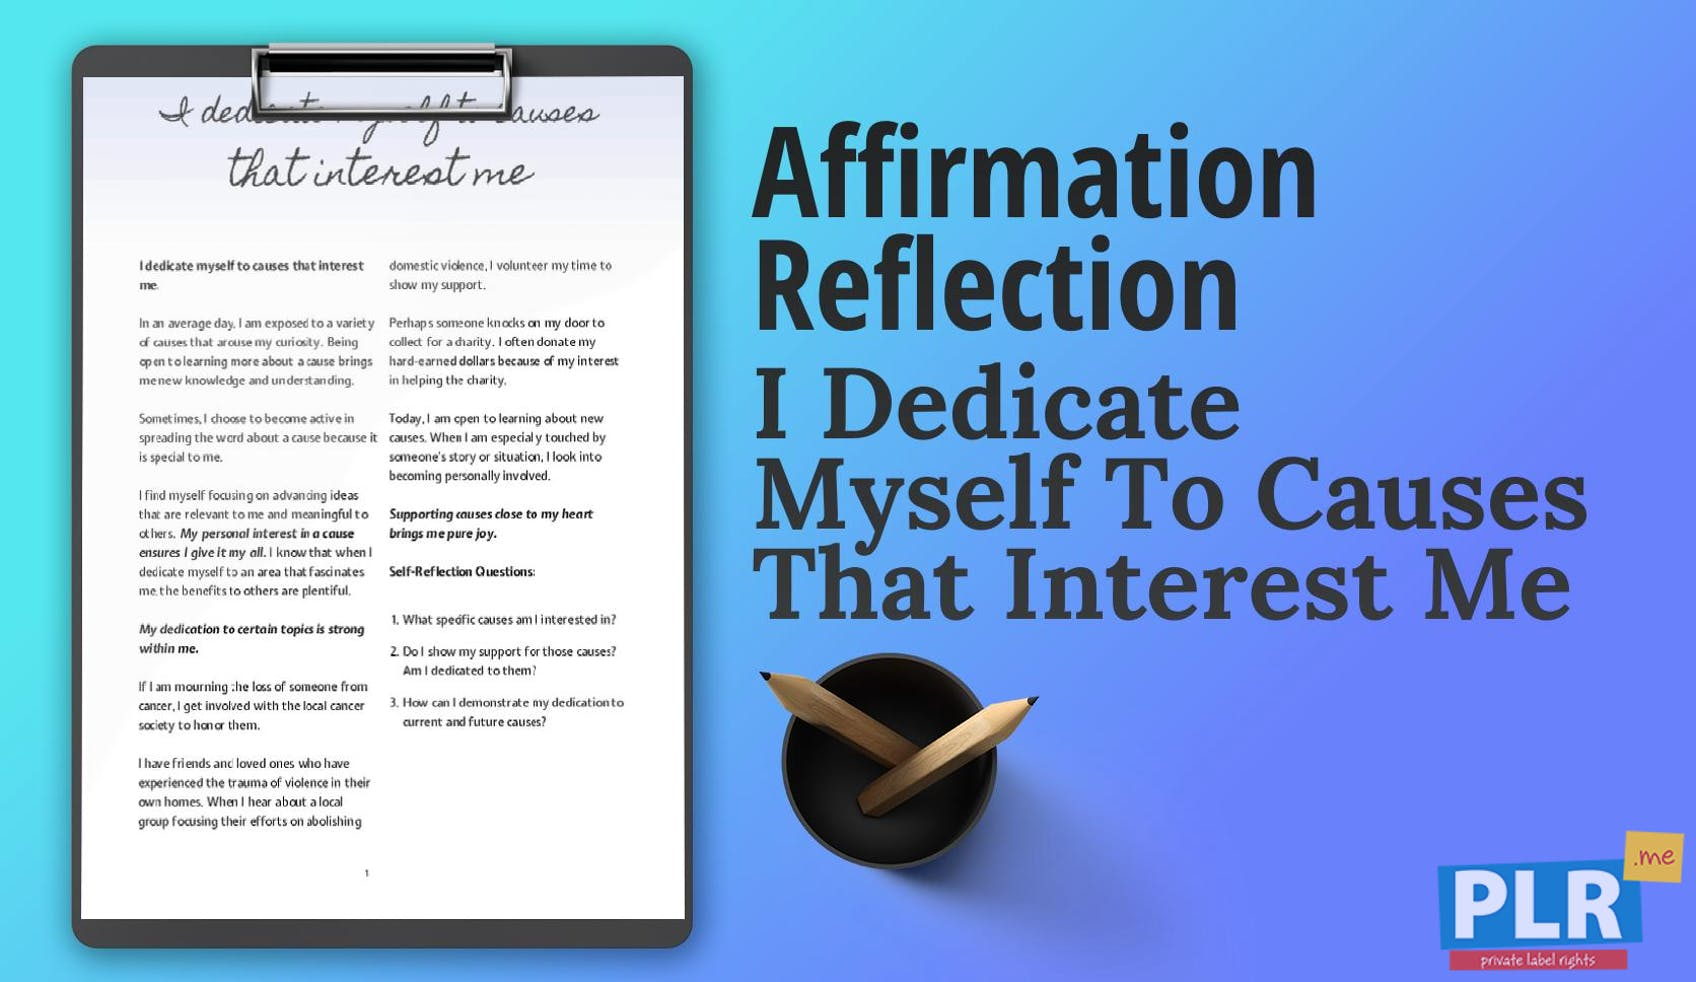 I Dedicate Myself To Causes That Interest Me